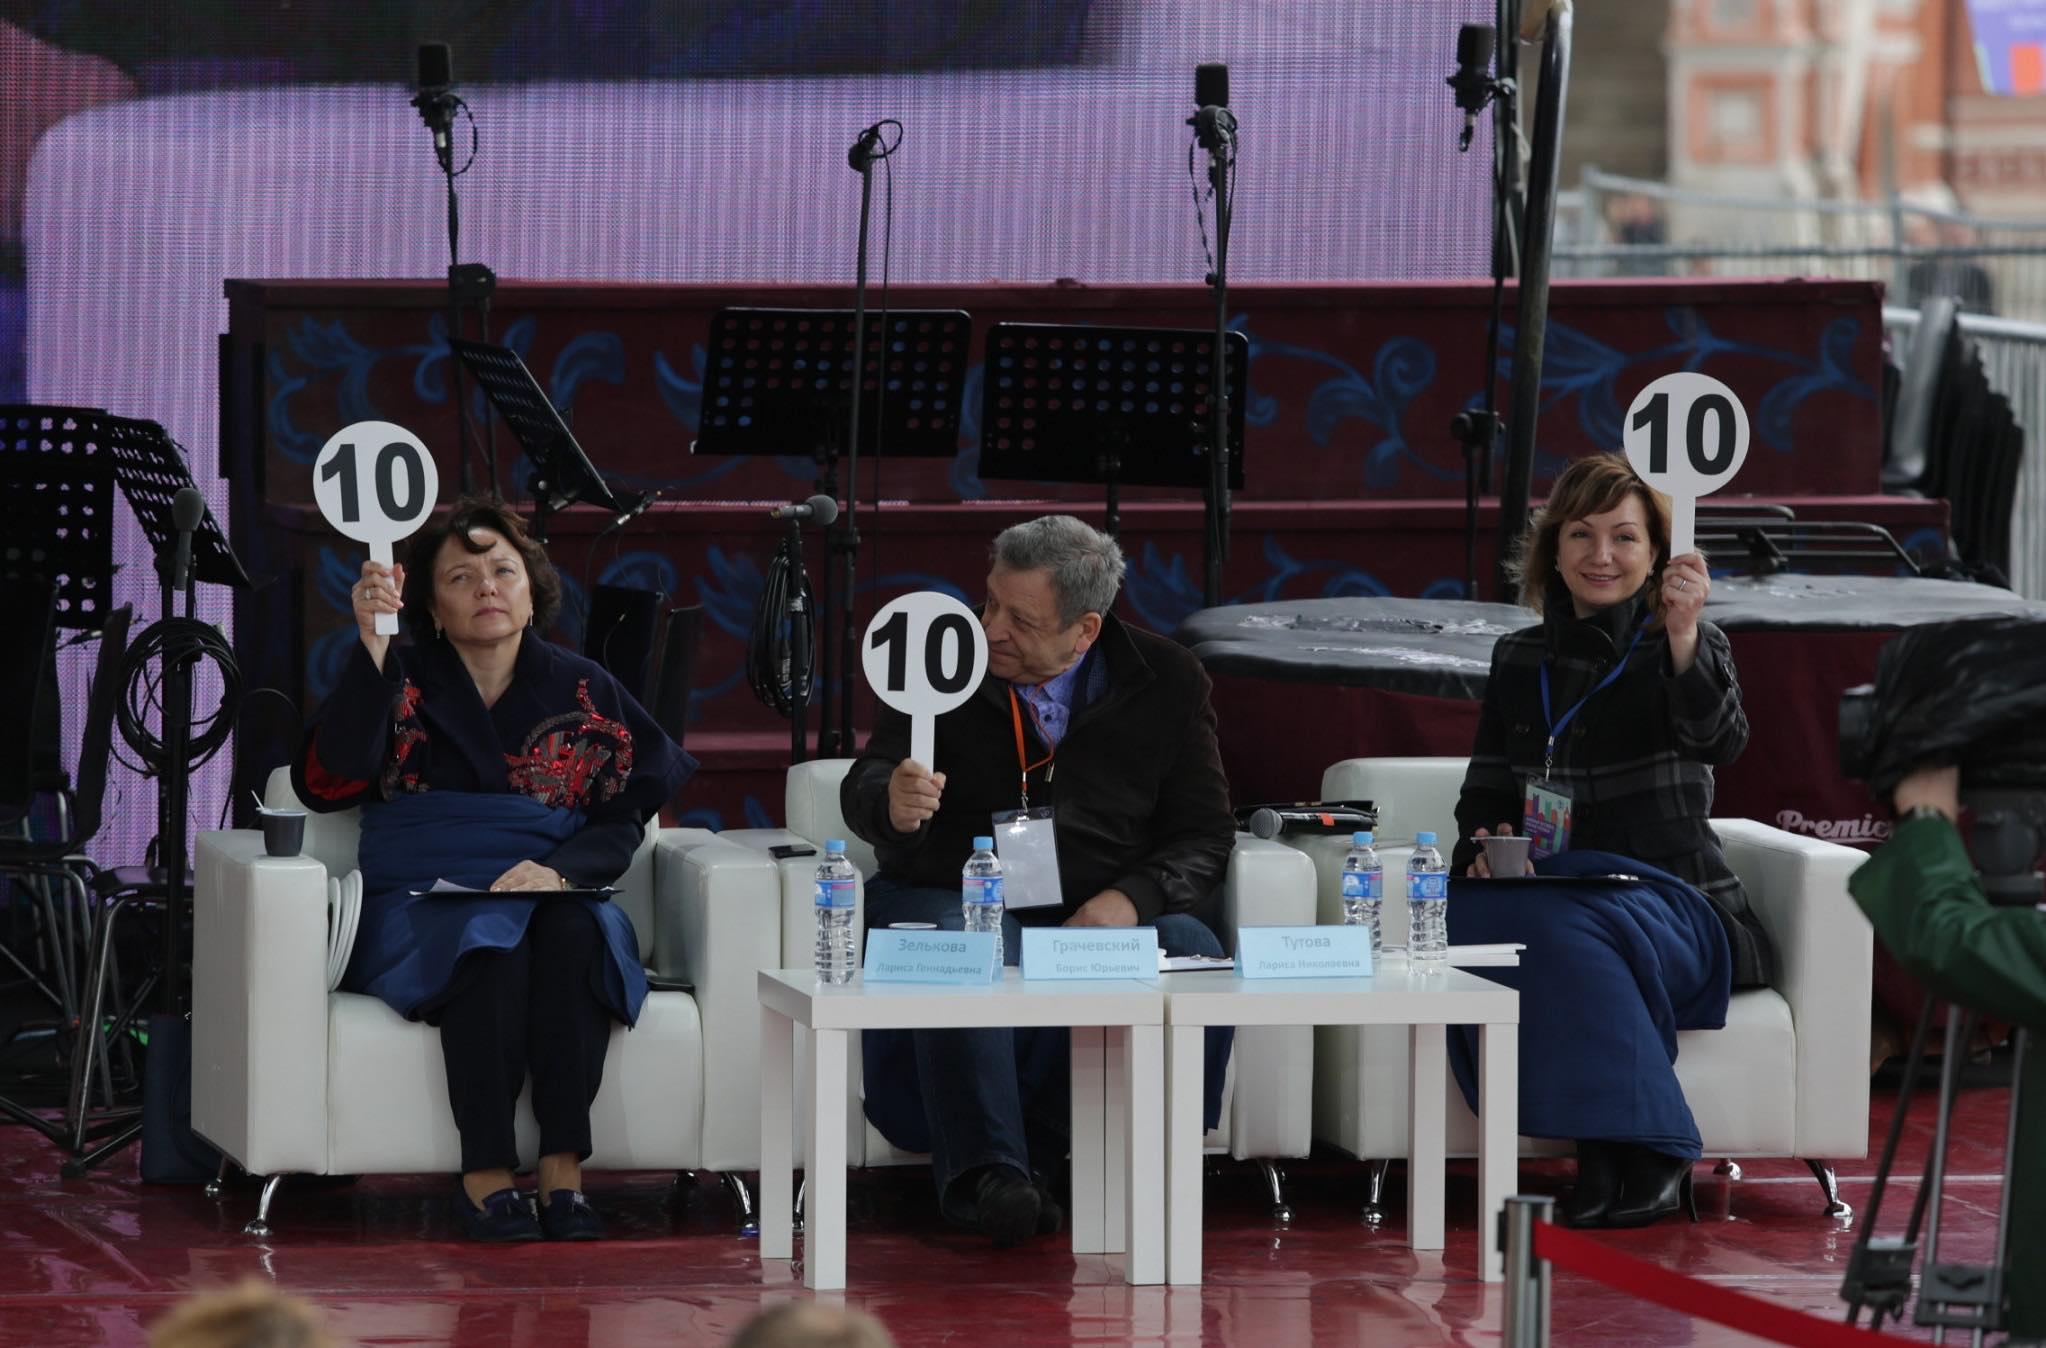 Лариса Зелькова, Борис Грачевский, Лариса Тутова